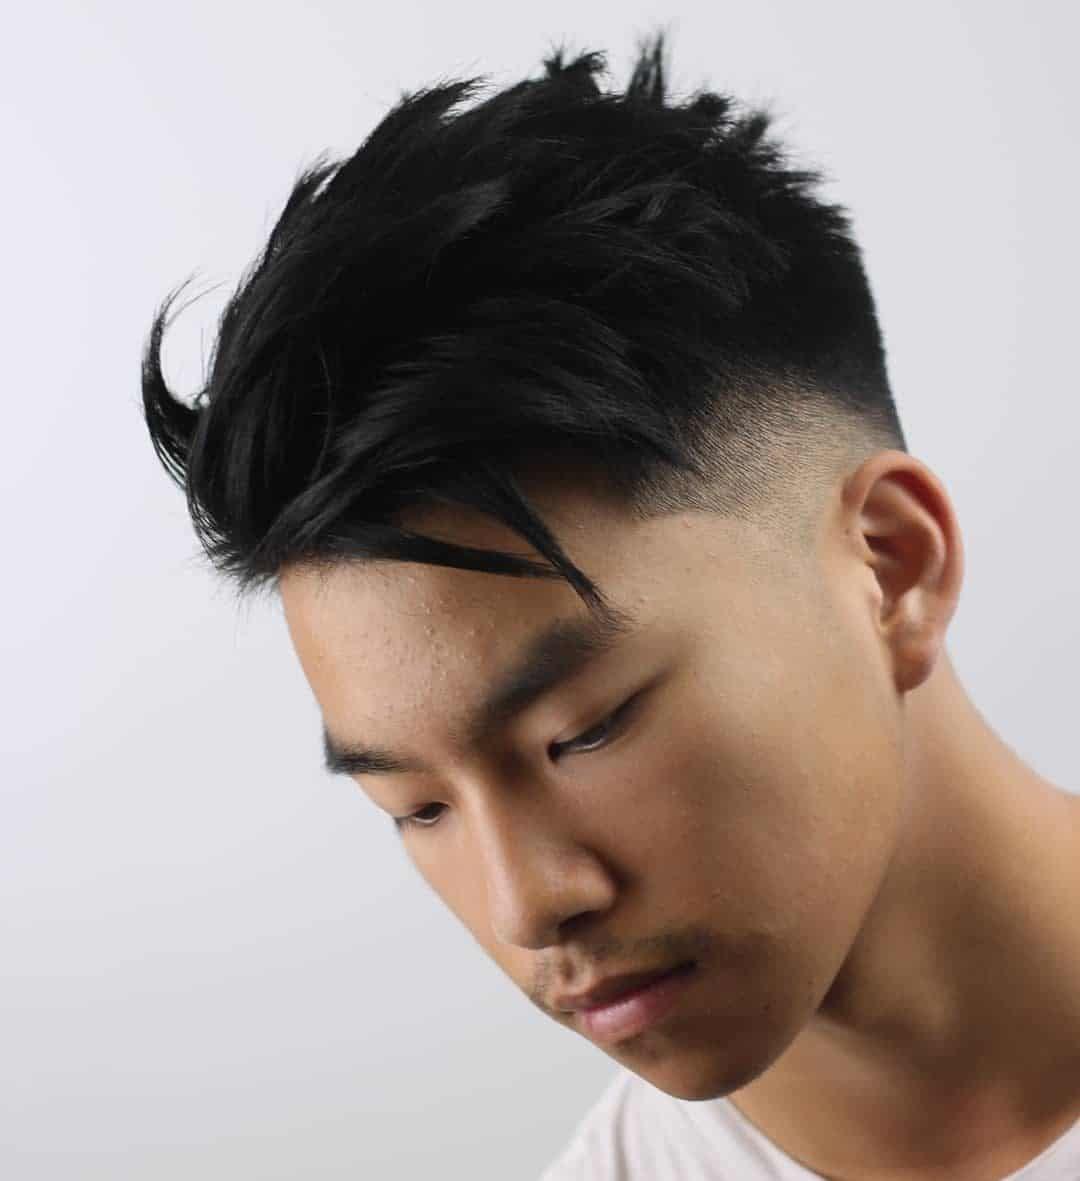 29 Best Hairstyles For Asian Men 2020 Styles Asian Men Hairstyle Asian Man Haircut Asian Hair